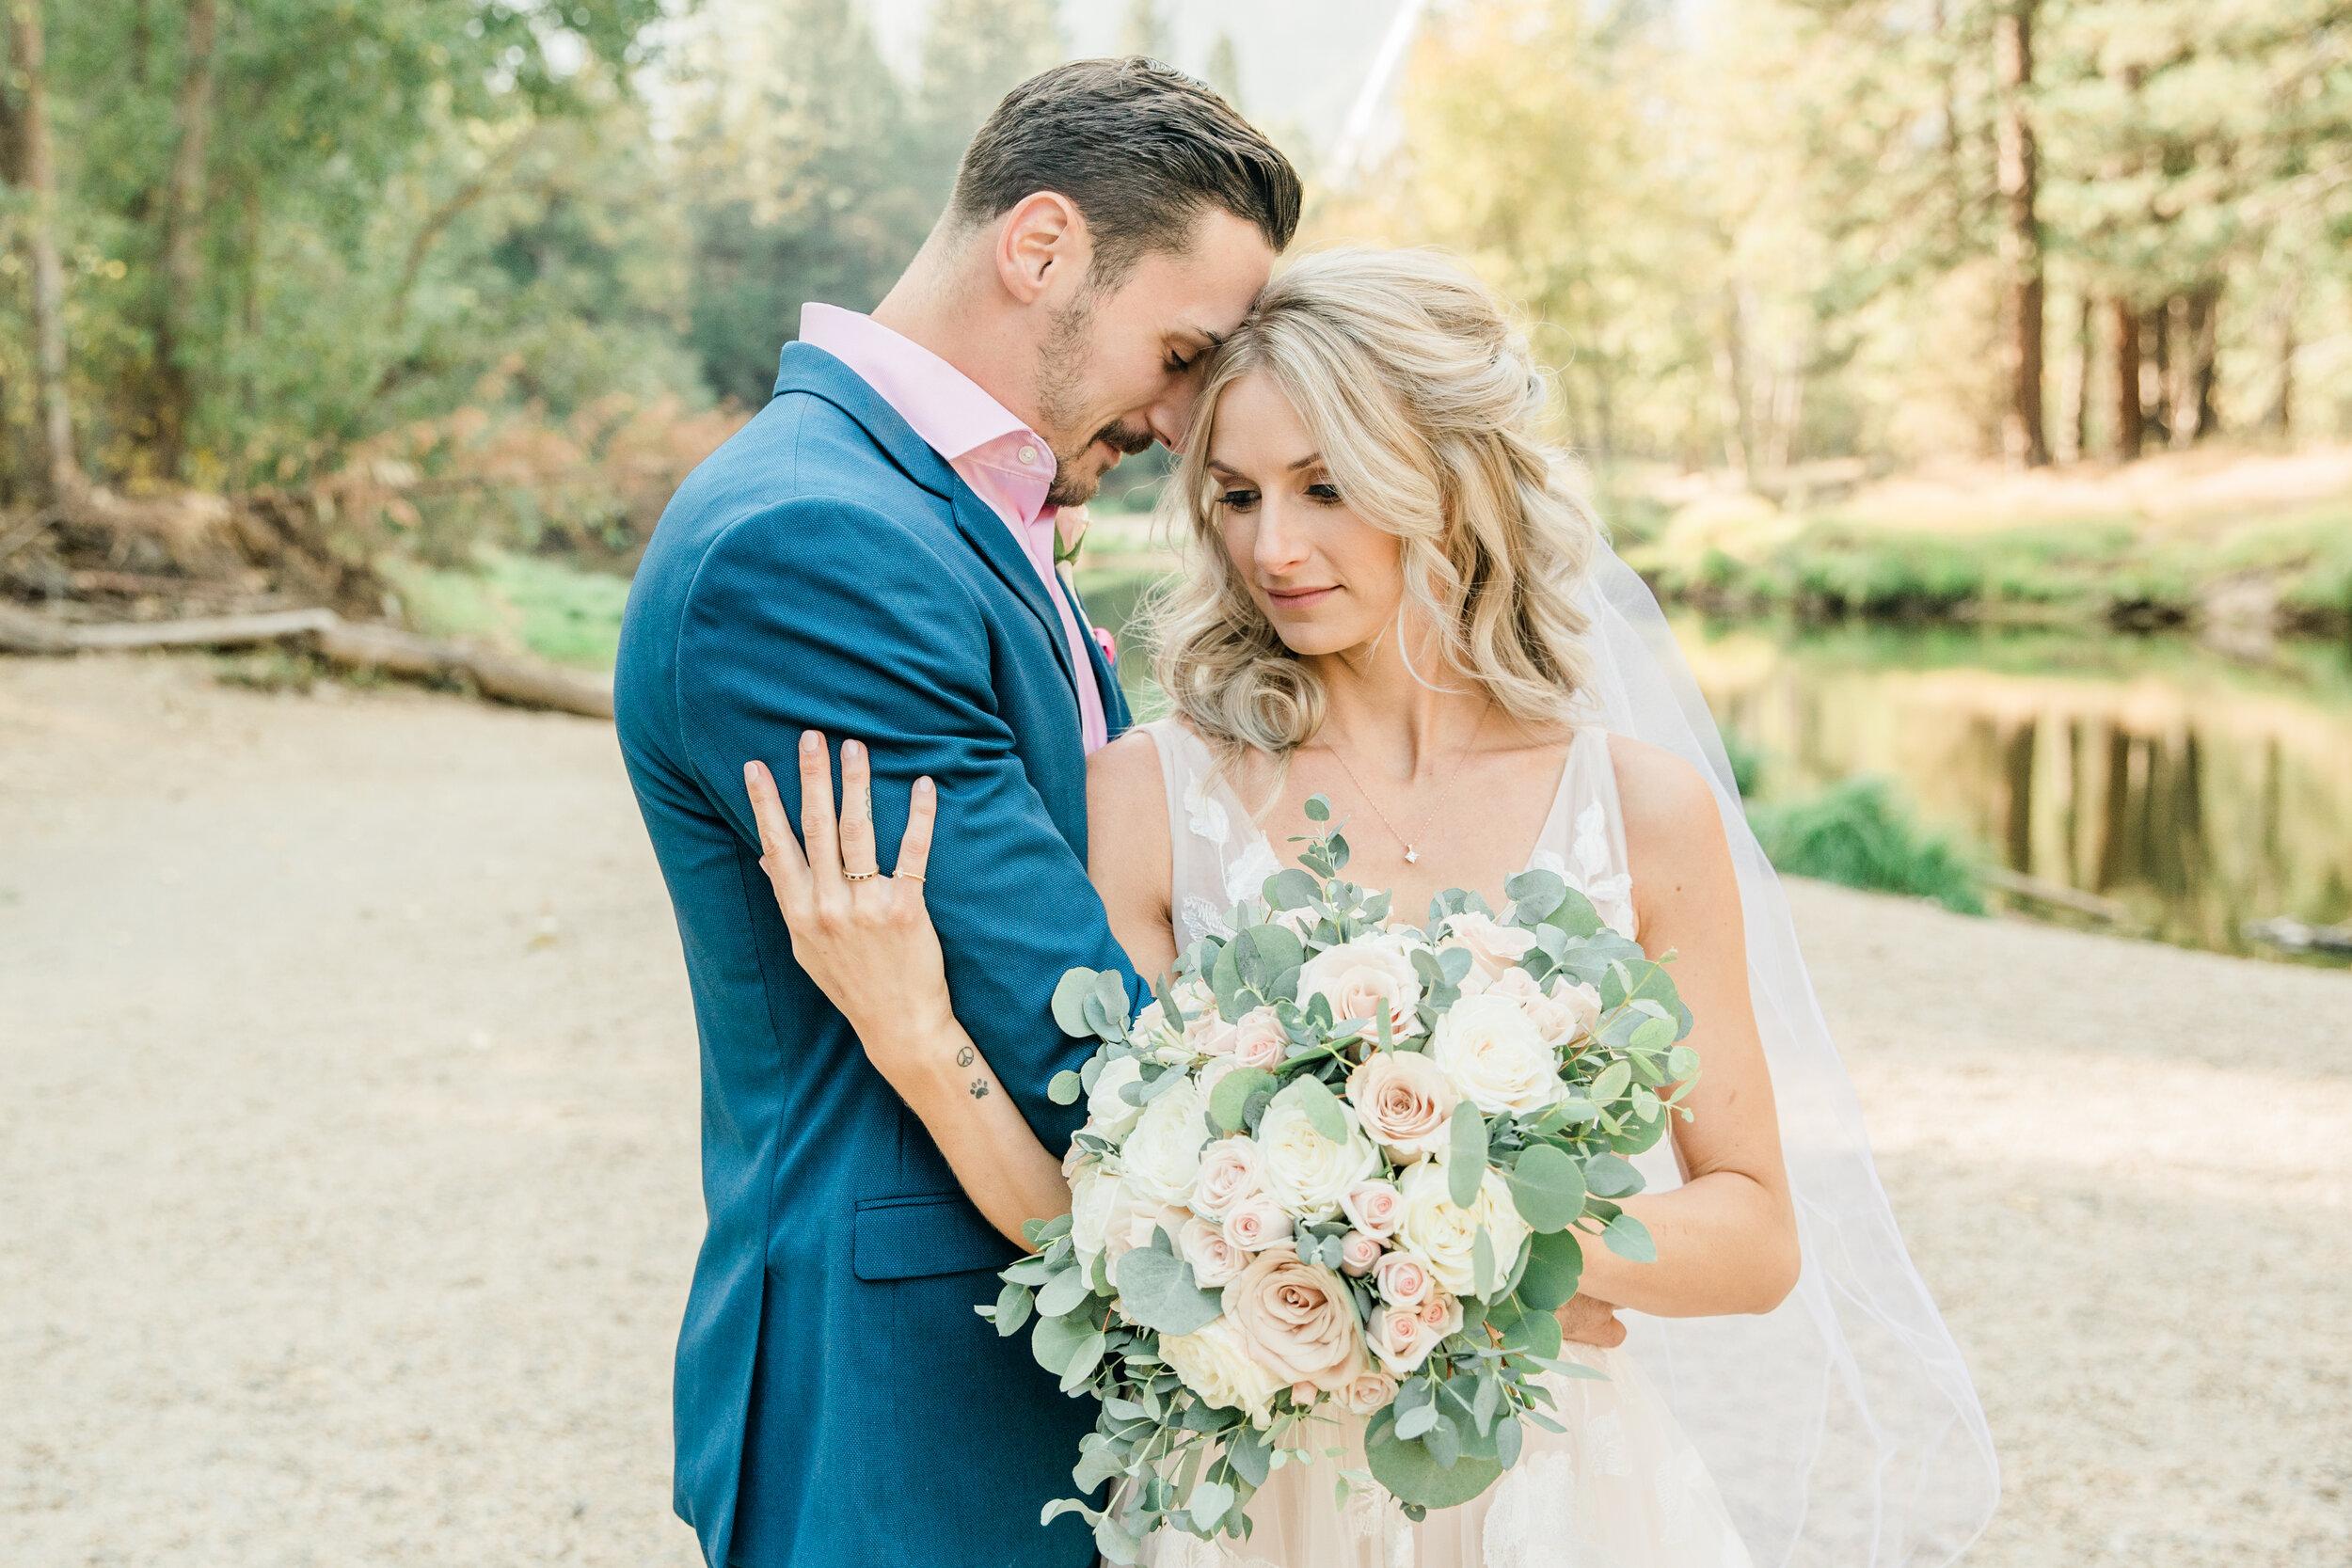 Leanne and Joe - Married - Sneak Peeks - Lauren Alisse Photography-28.jpg